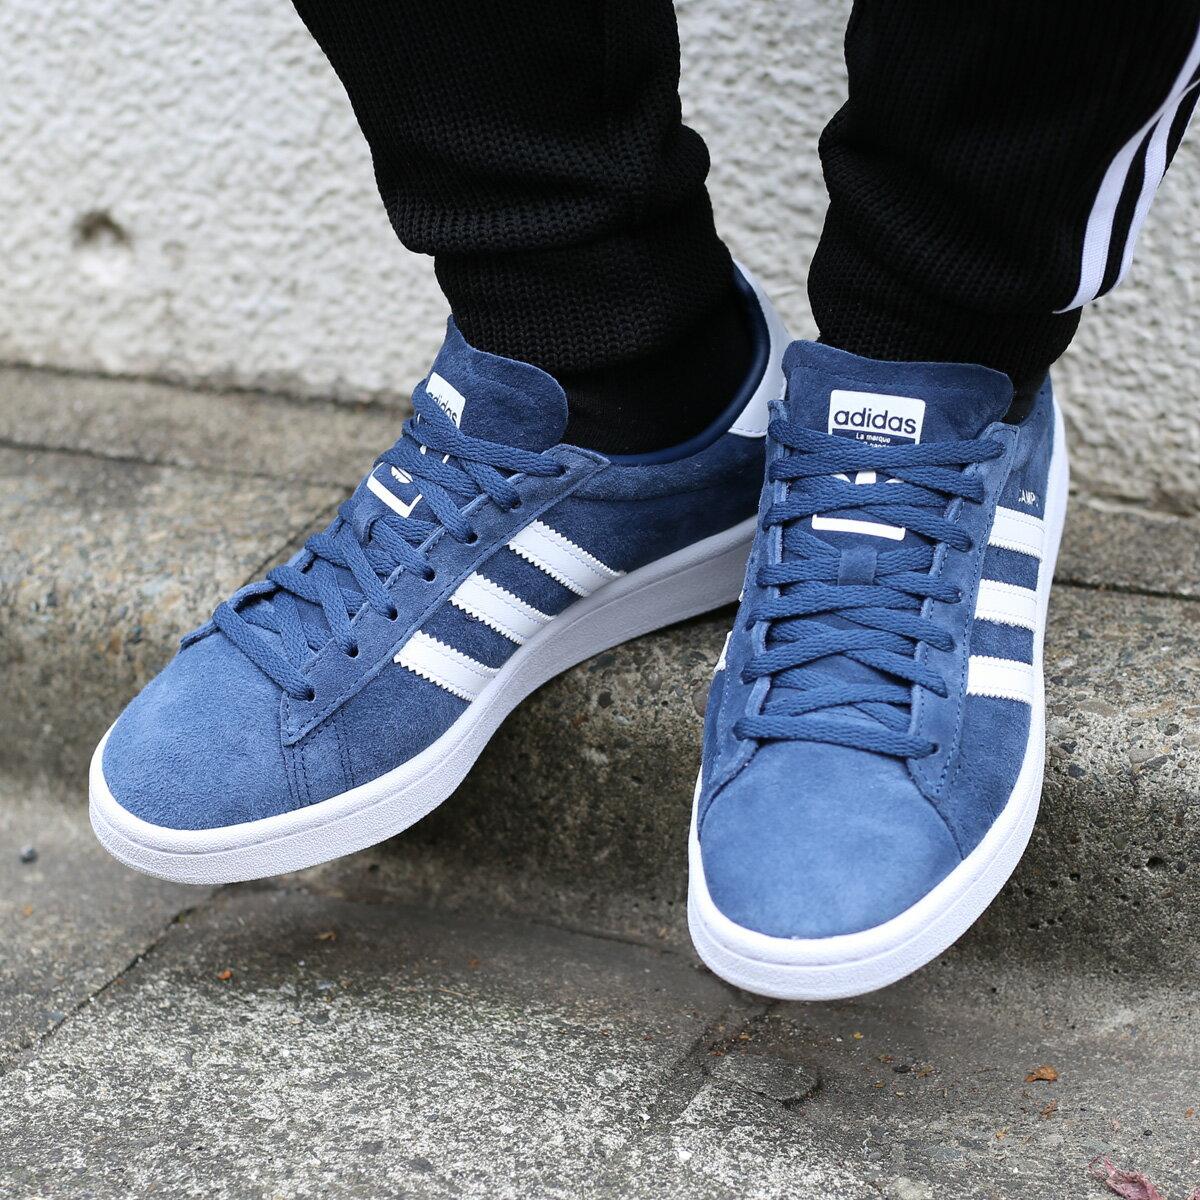 adidas Originals CAMPUS W (アディダス オリジナルス キャンパス W)Mineral Blue/Running White/Running White【レディース スニーカー】18SS-I